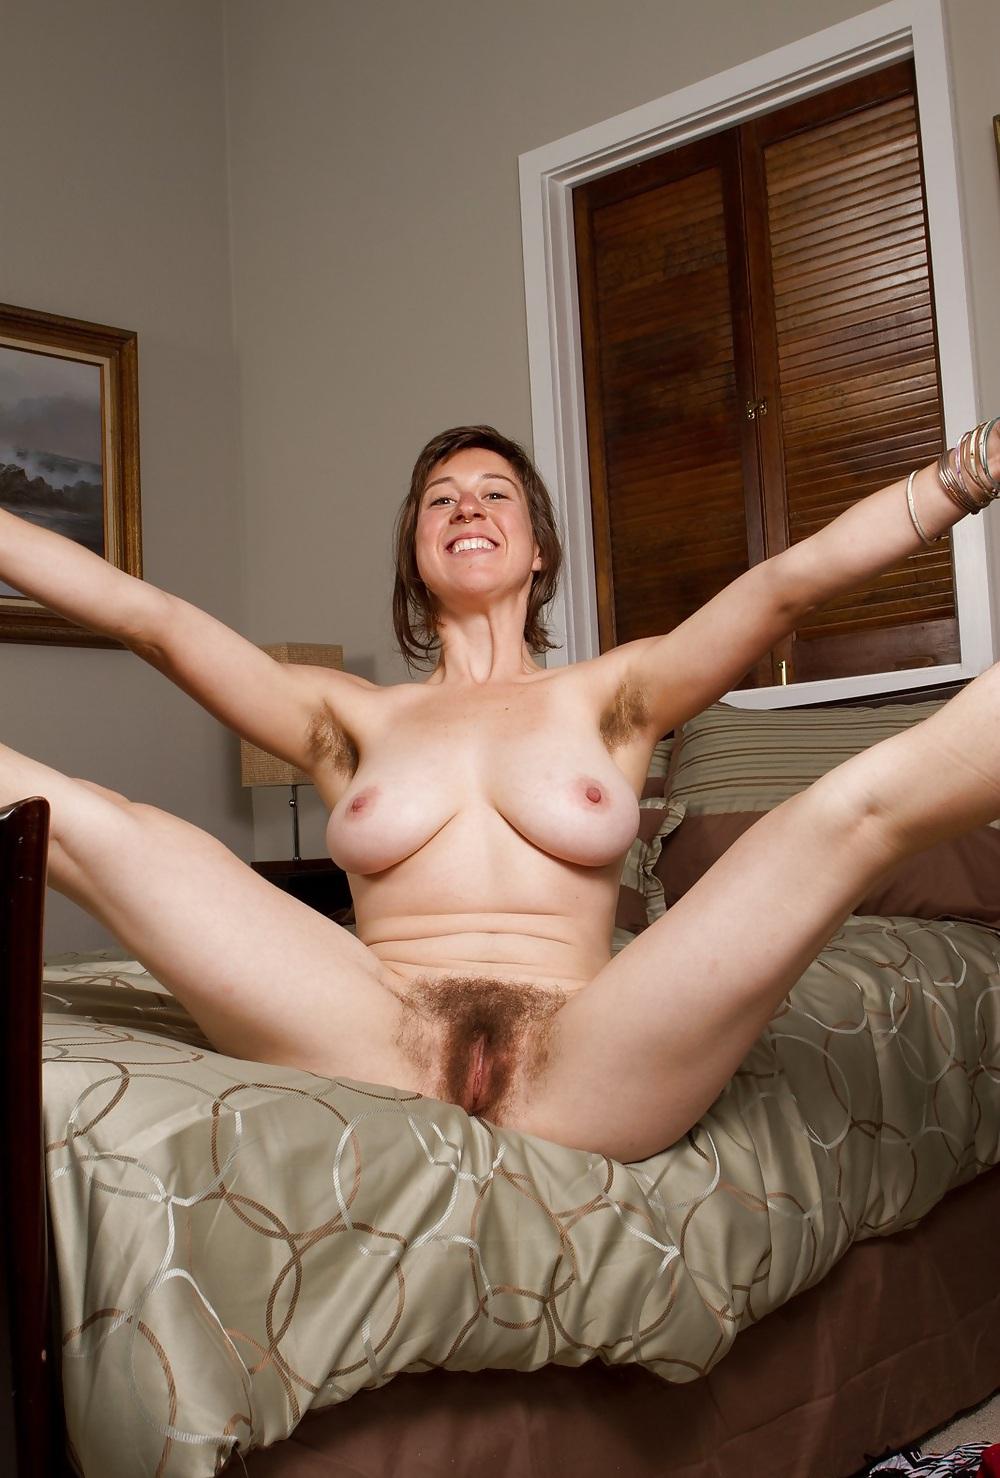 Malgache naked mature hairy pussy — photo 14